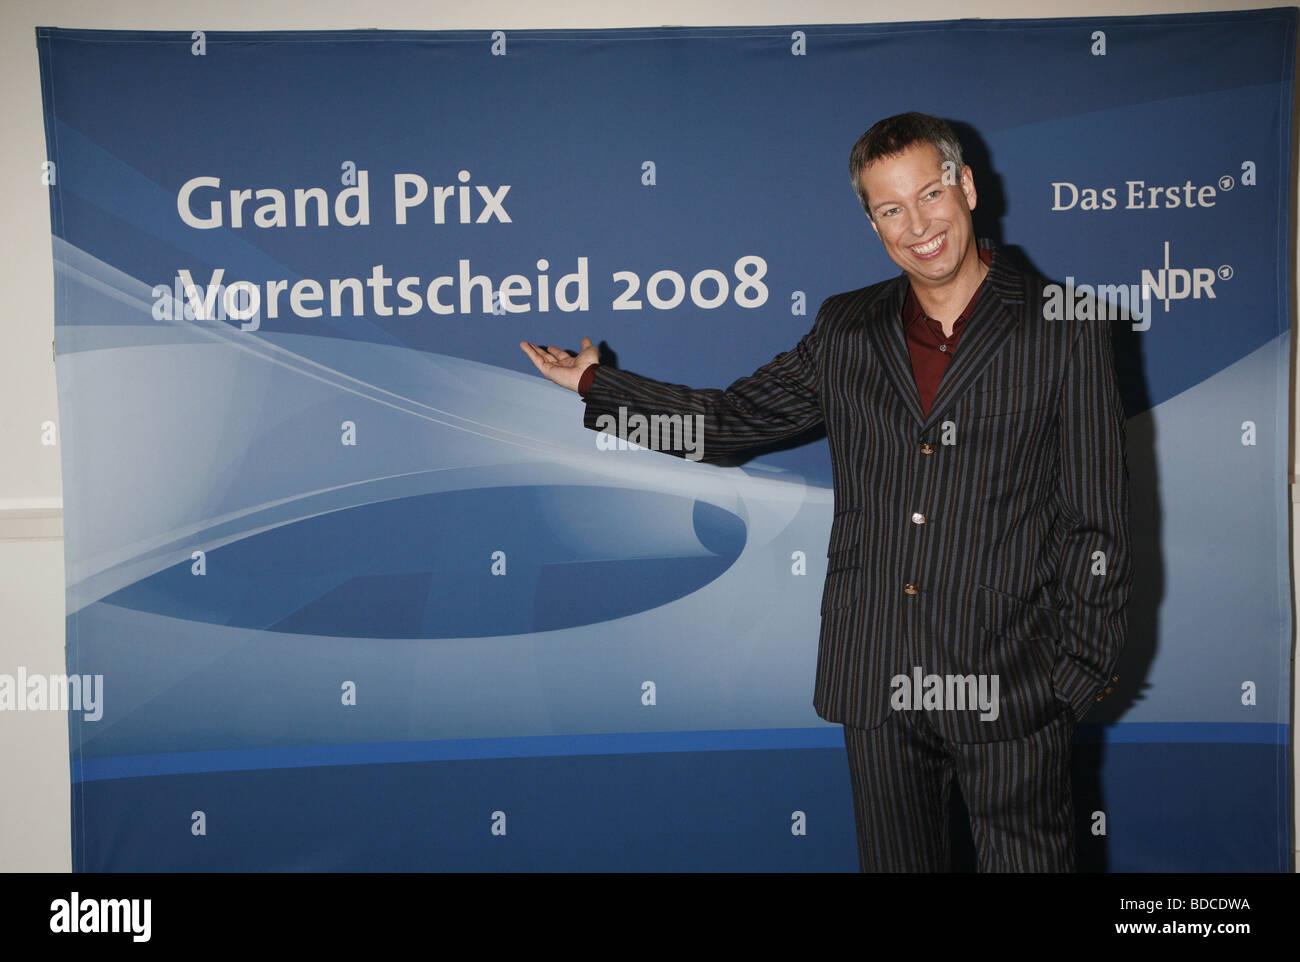 tv show 'Grand Prix preliminary decision 2008' DEU 2008, tv presenter Thomas Hermanns, Third-Party-Permissions - Stock Image